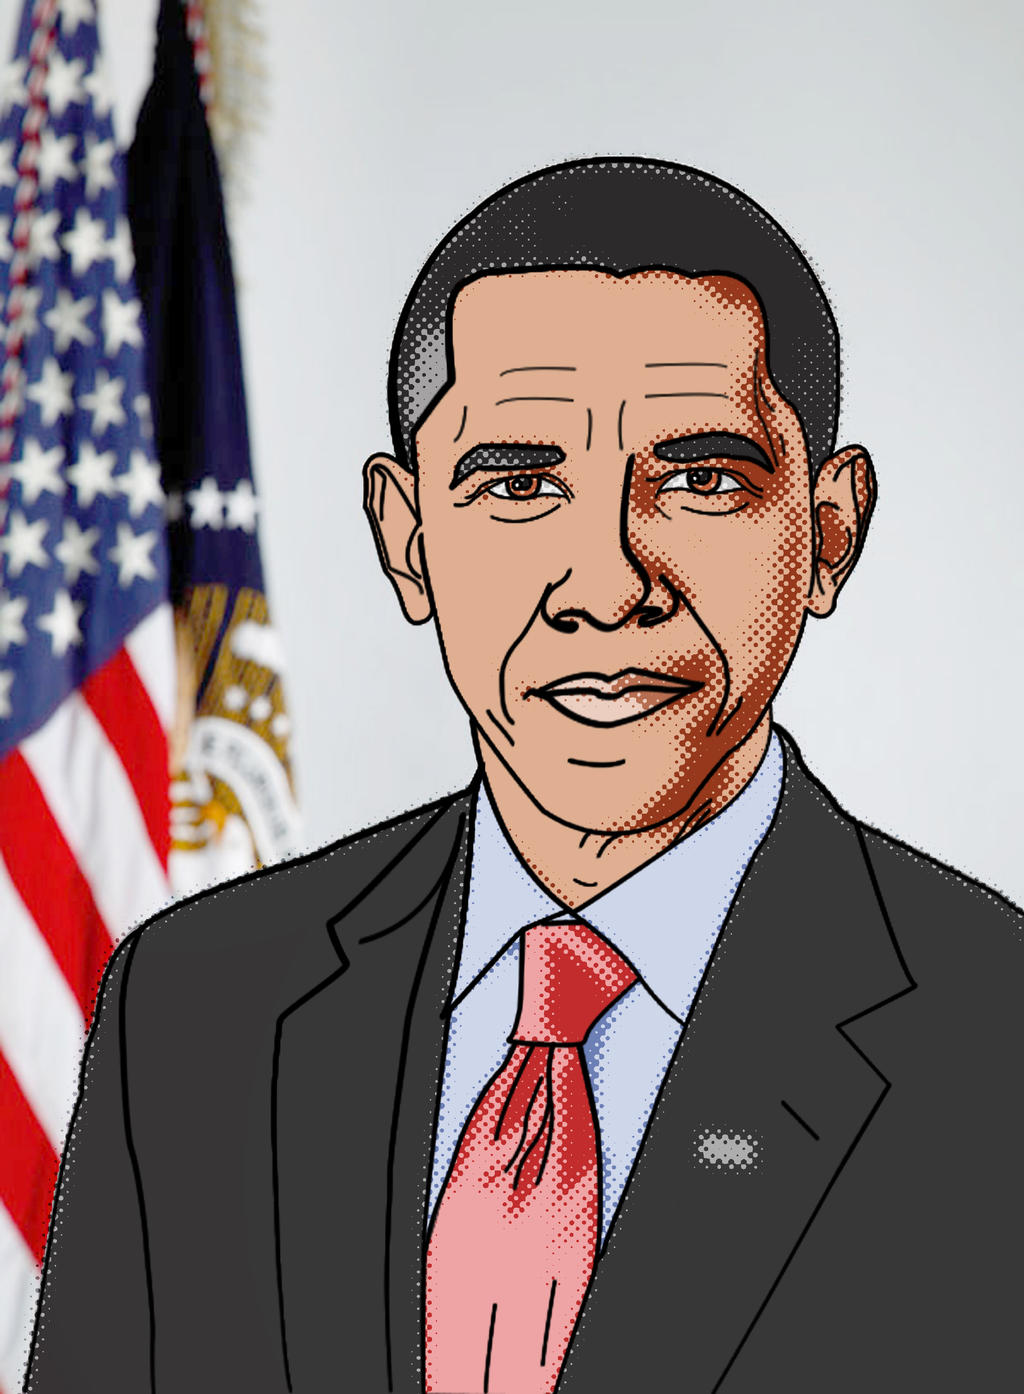 Постер в стиле Obama Hope Уроки Фотошопа